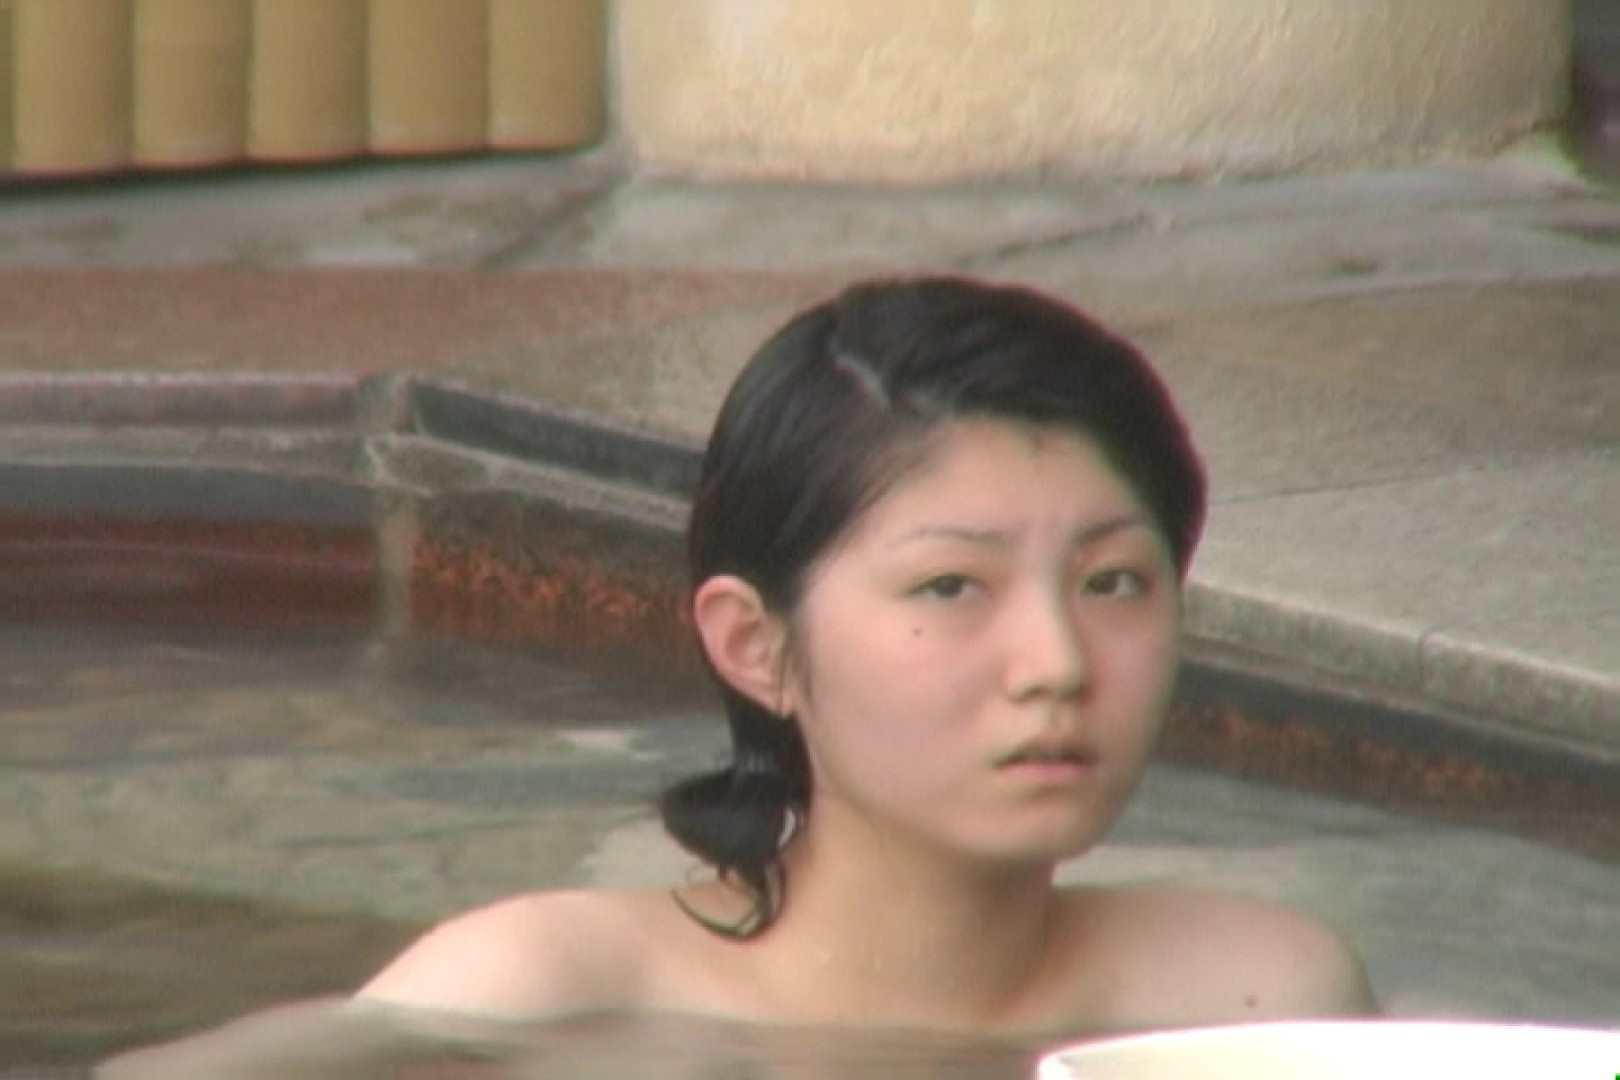 Aquaな露天風呂Vol.579 盗撮 隠し撮りオマンコ動画紹介 42PICs 32